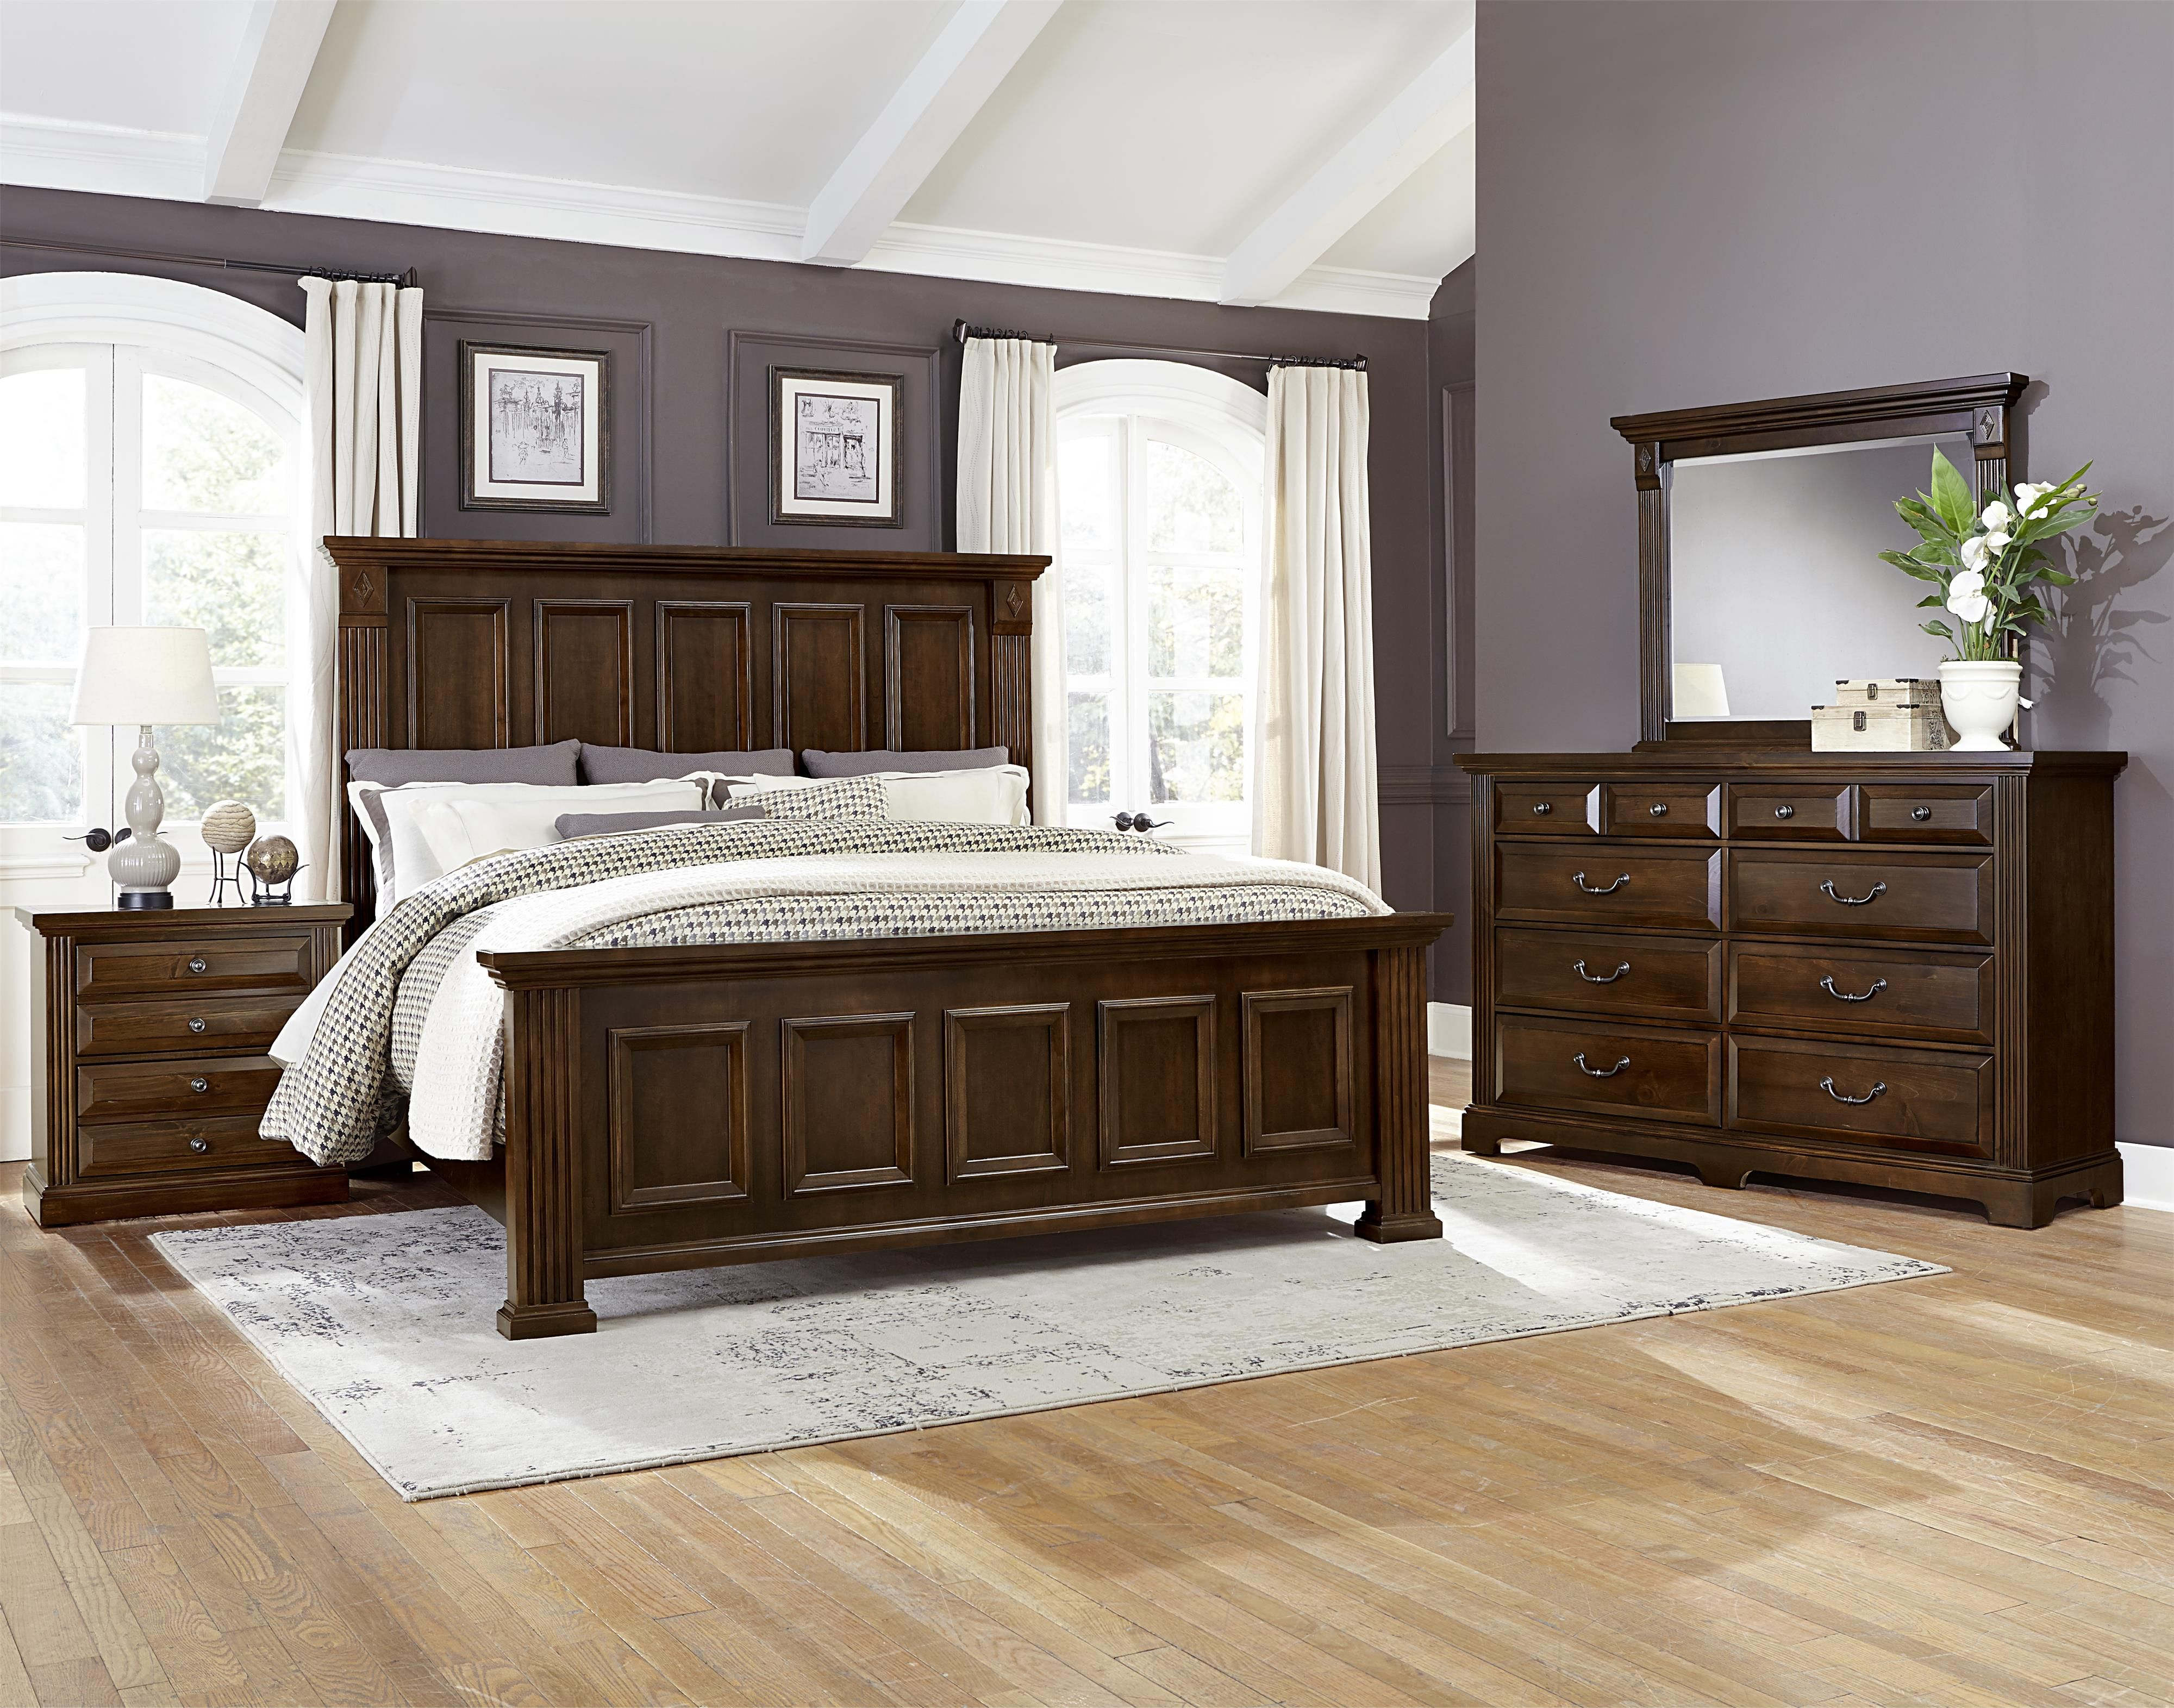 Master bedroom bed  Woodlands Transitional King Mansion Bed by Vaughan Bassett  King